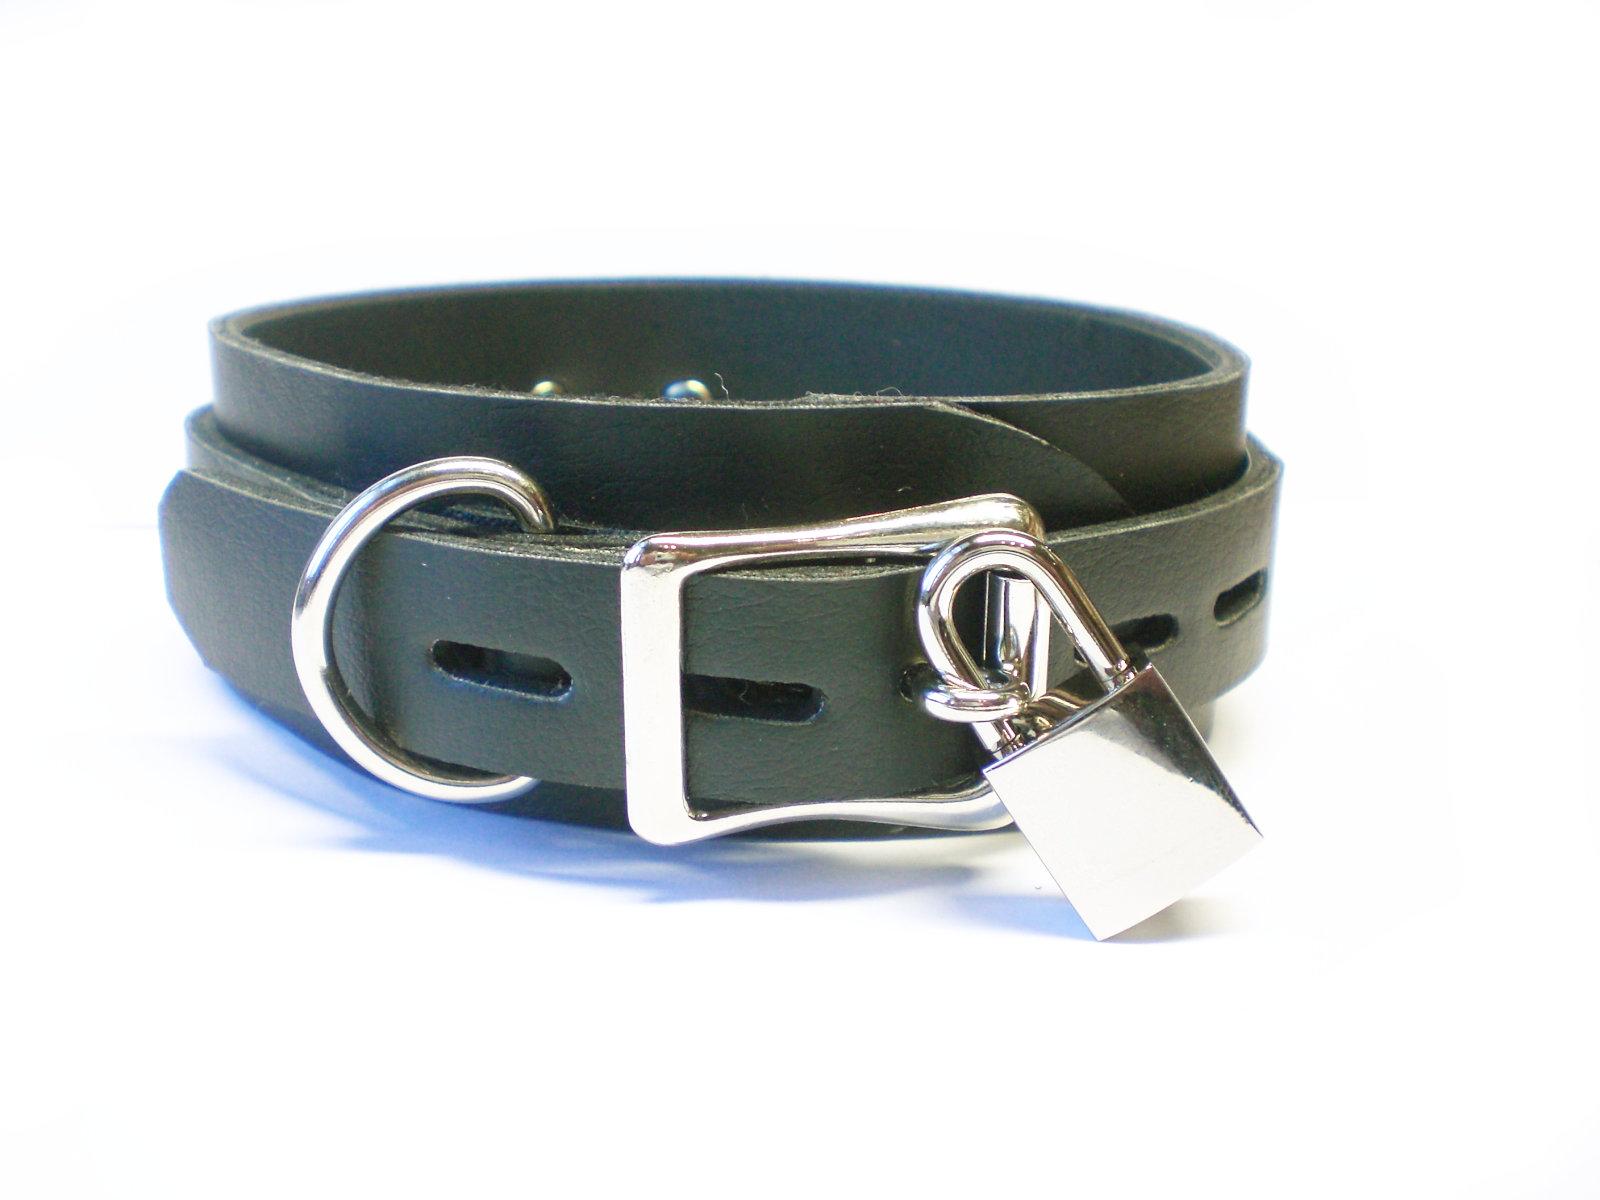 onyx black - lockable buckle